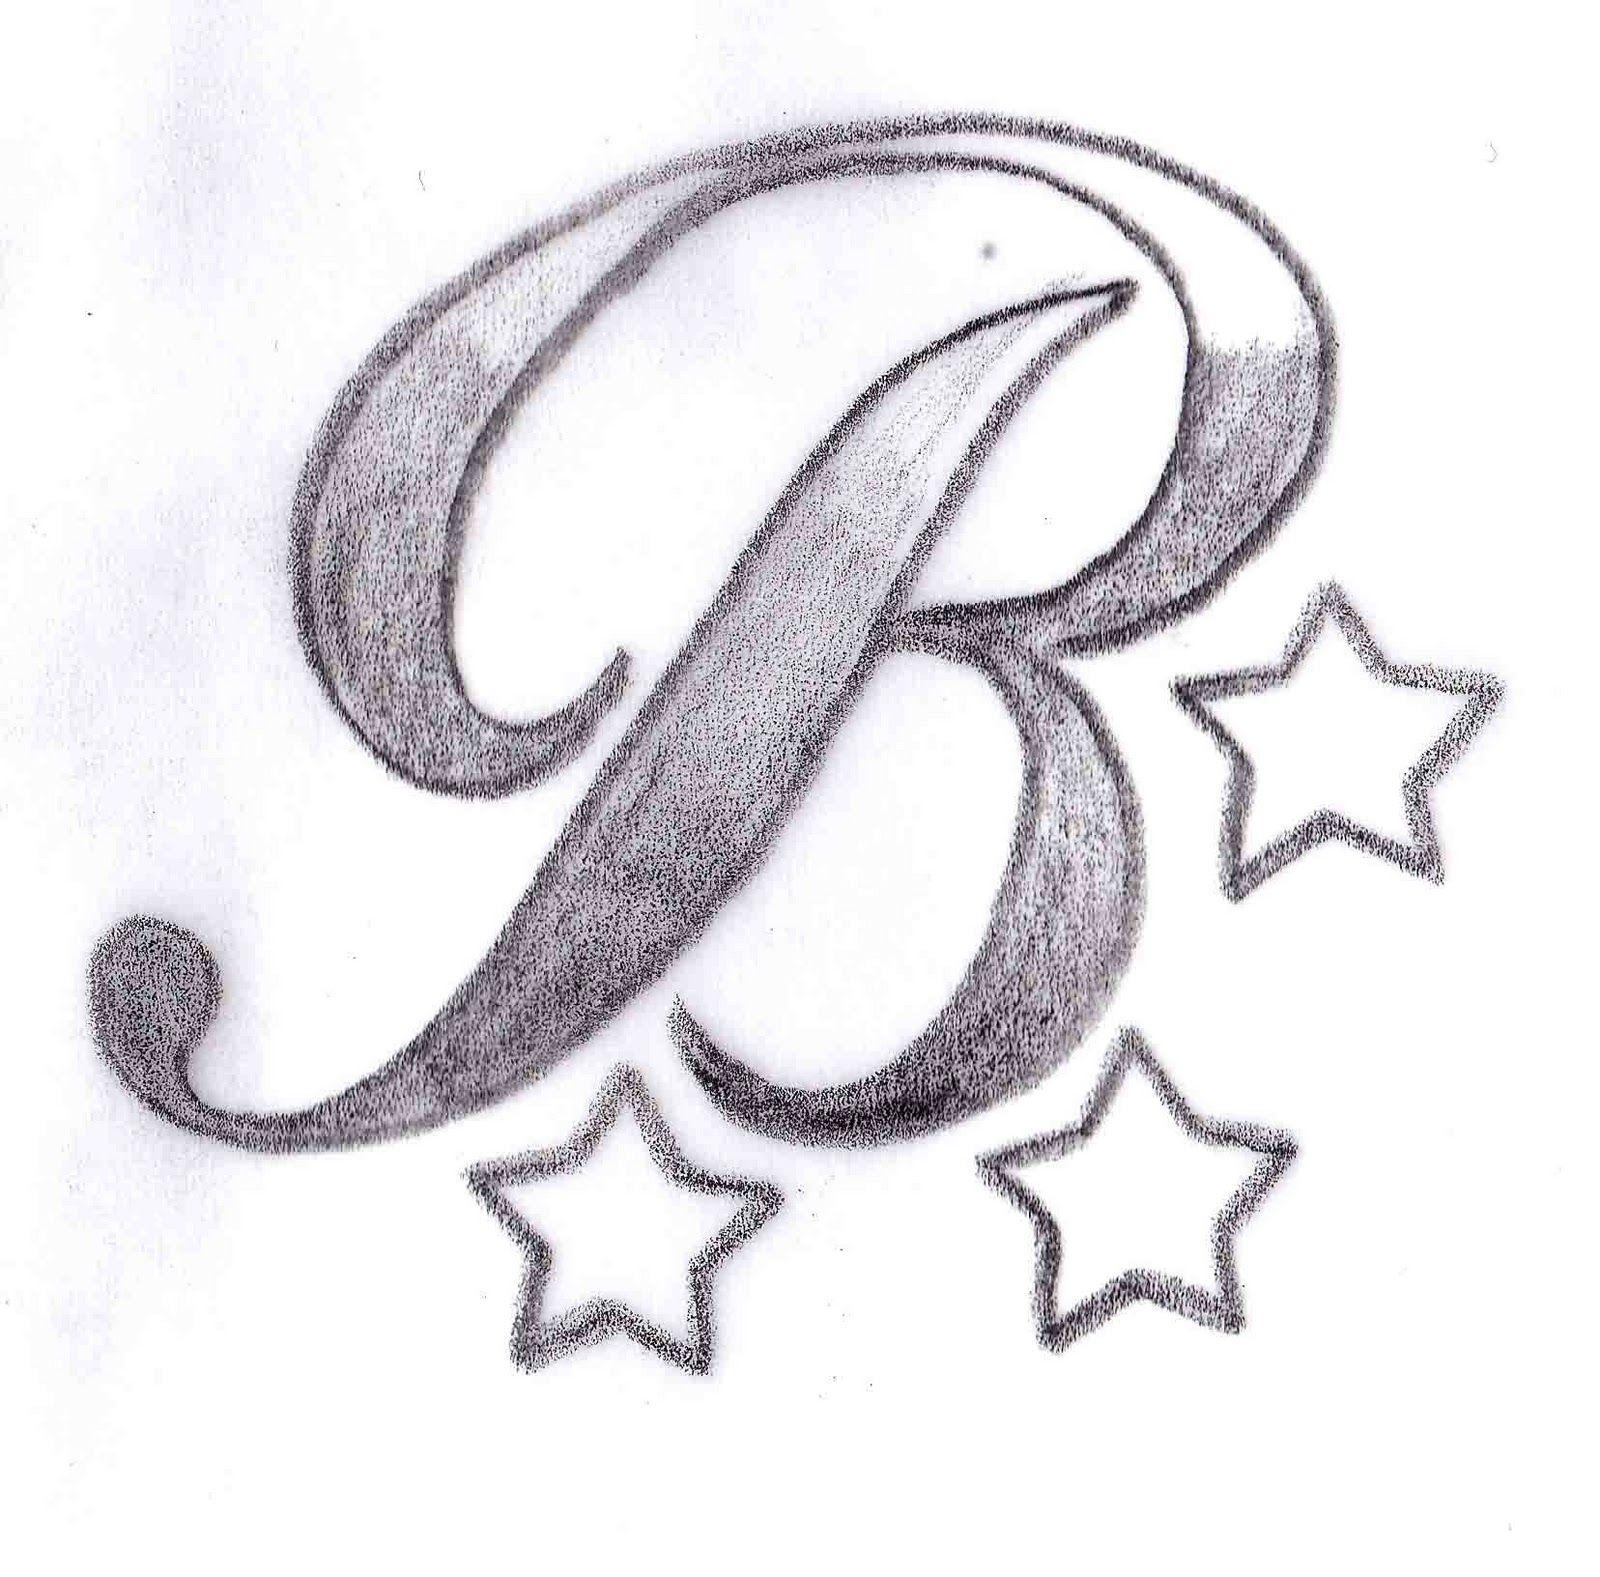 Letter B tattoo design 12 1600—1577